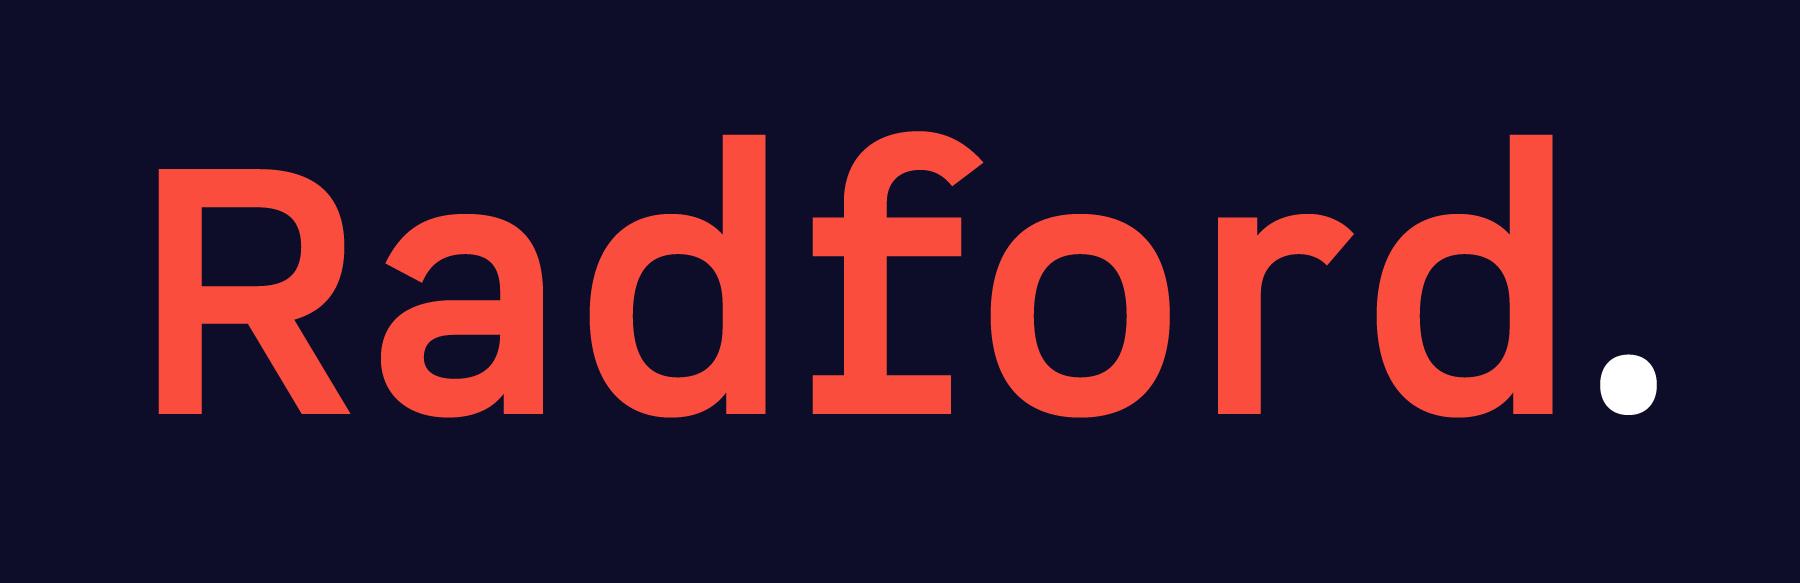 Radford Retail